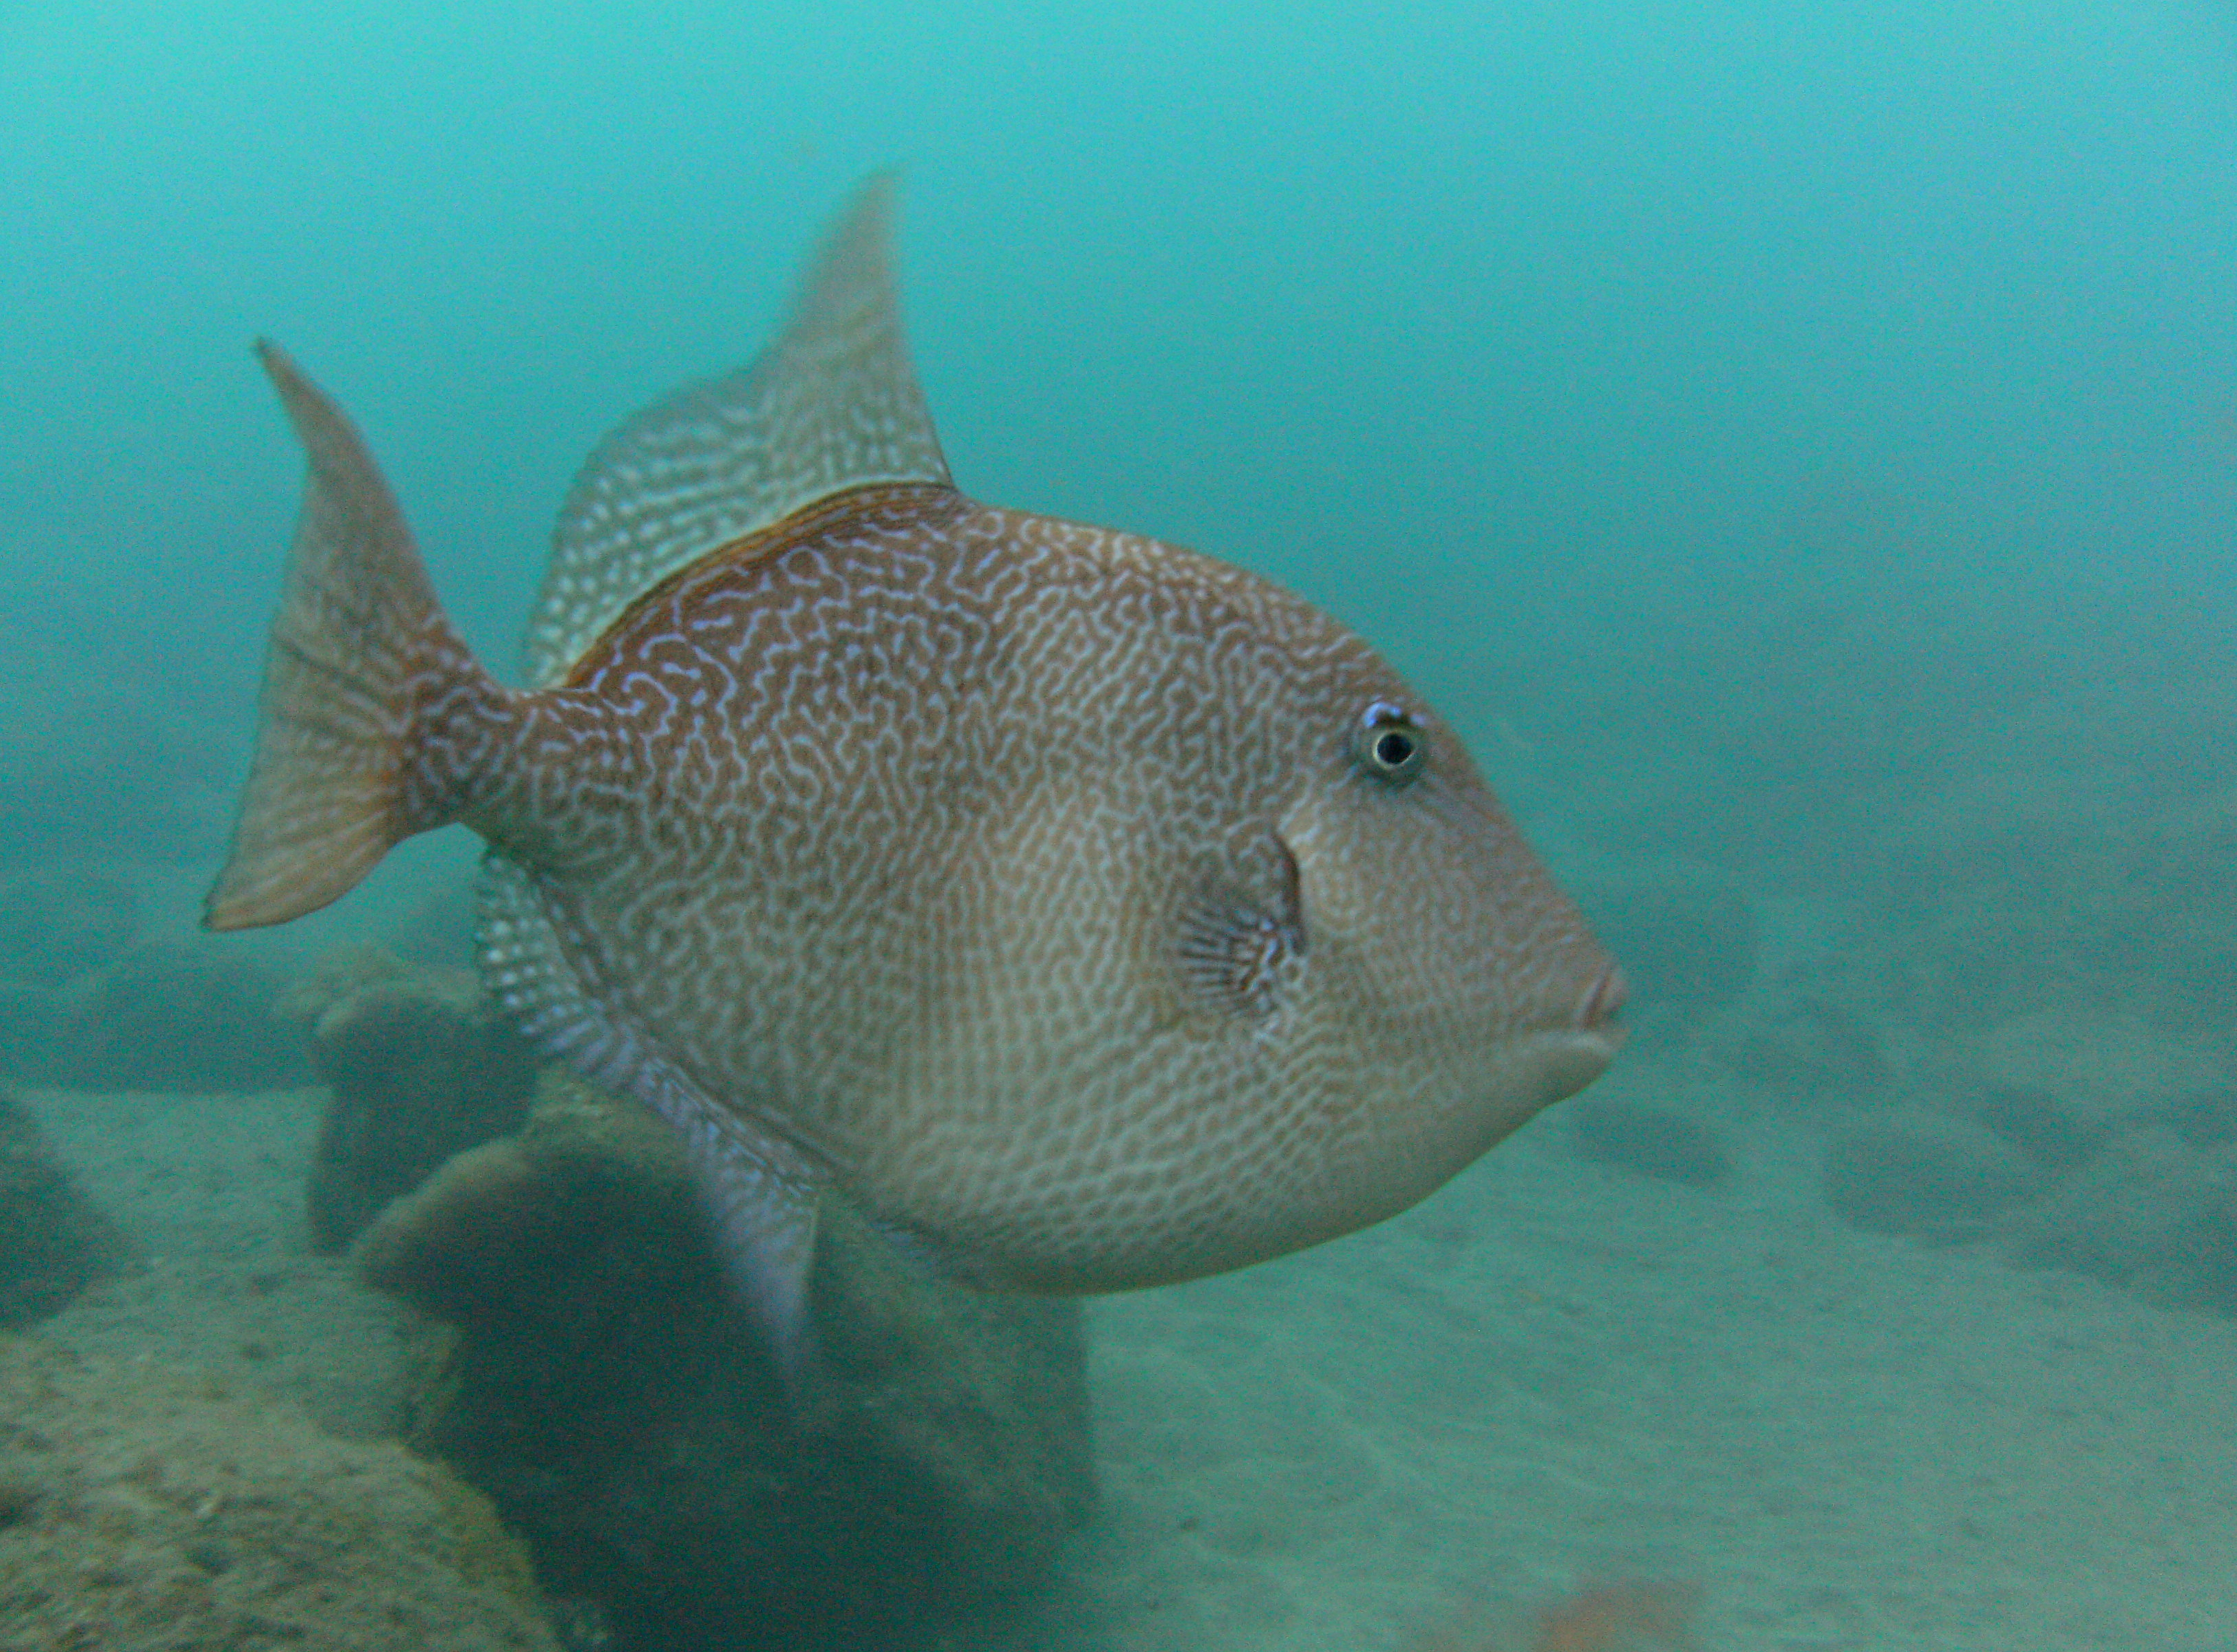 Diving-Tenerife-Aquatic-Life-Sharks-Sting-Rays-Fish-117.